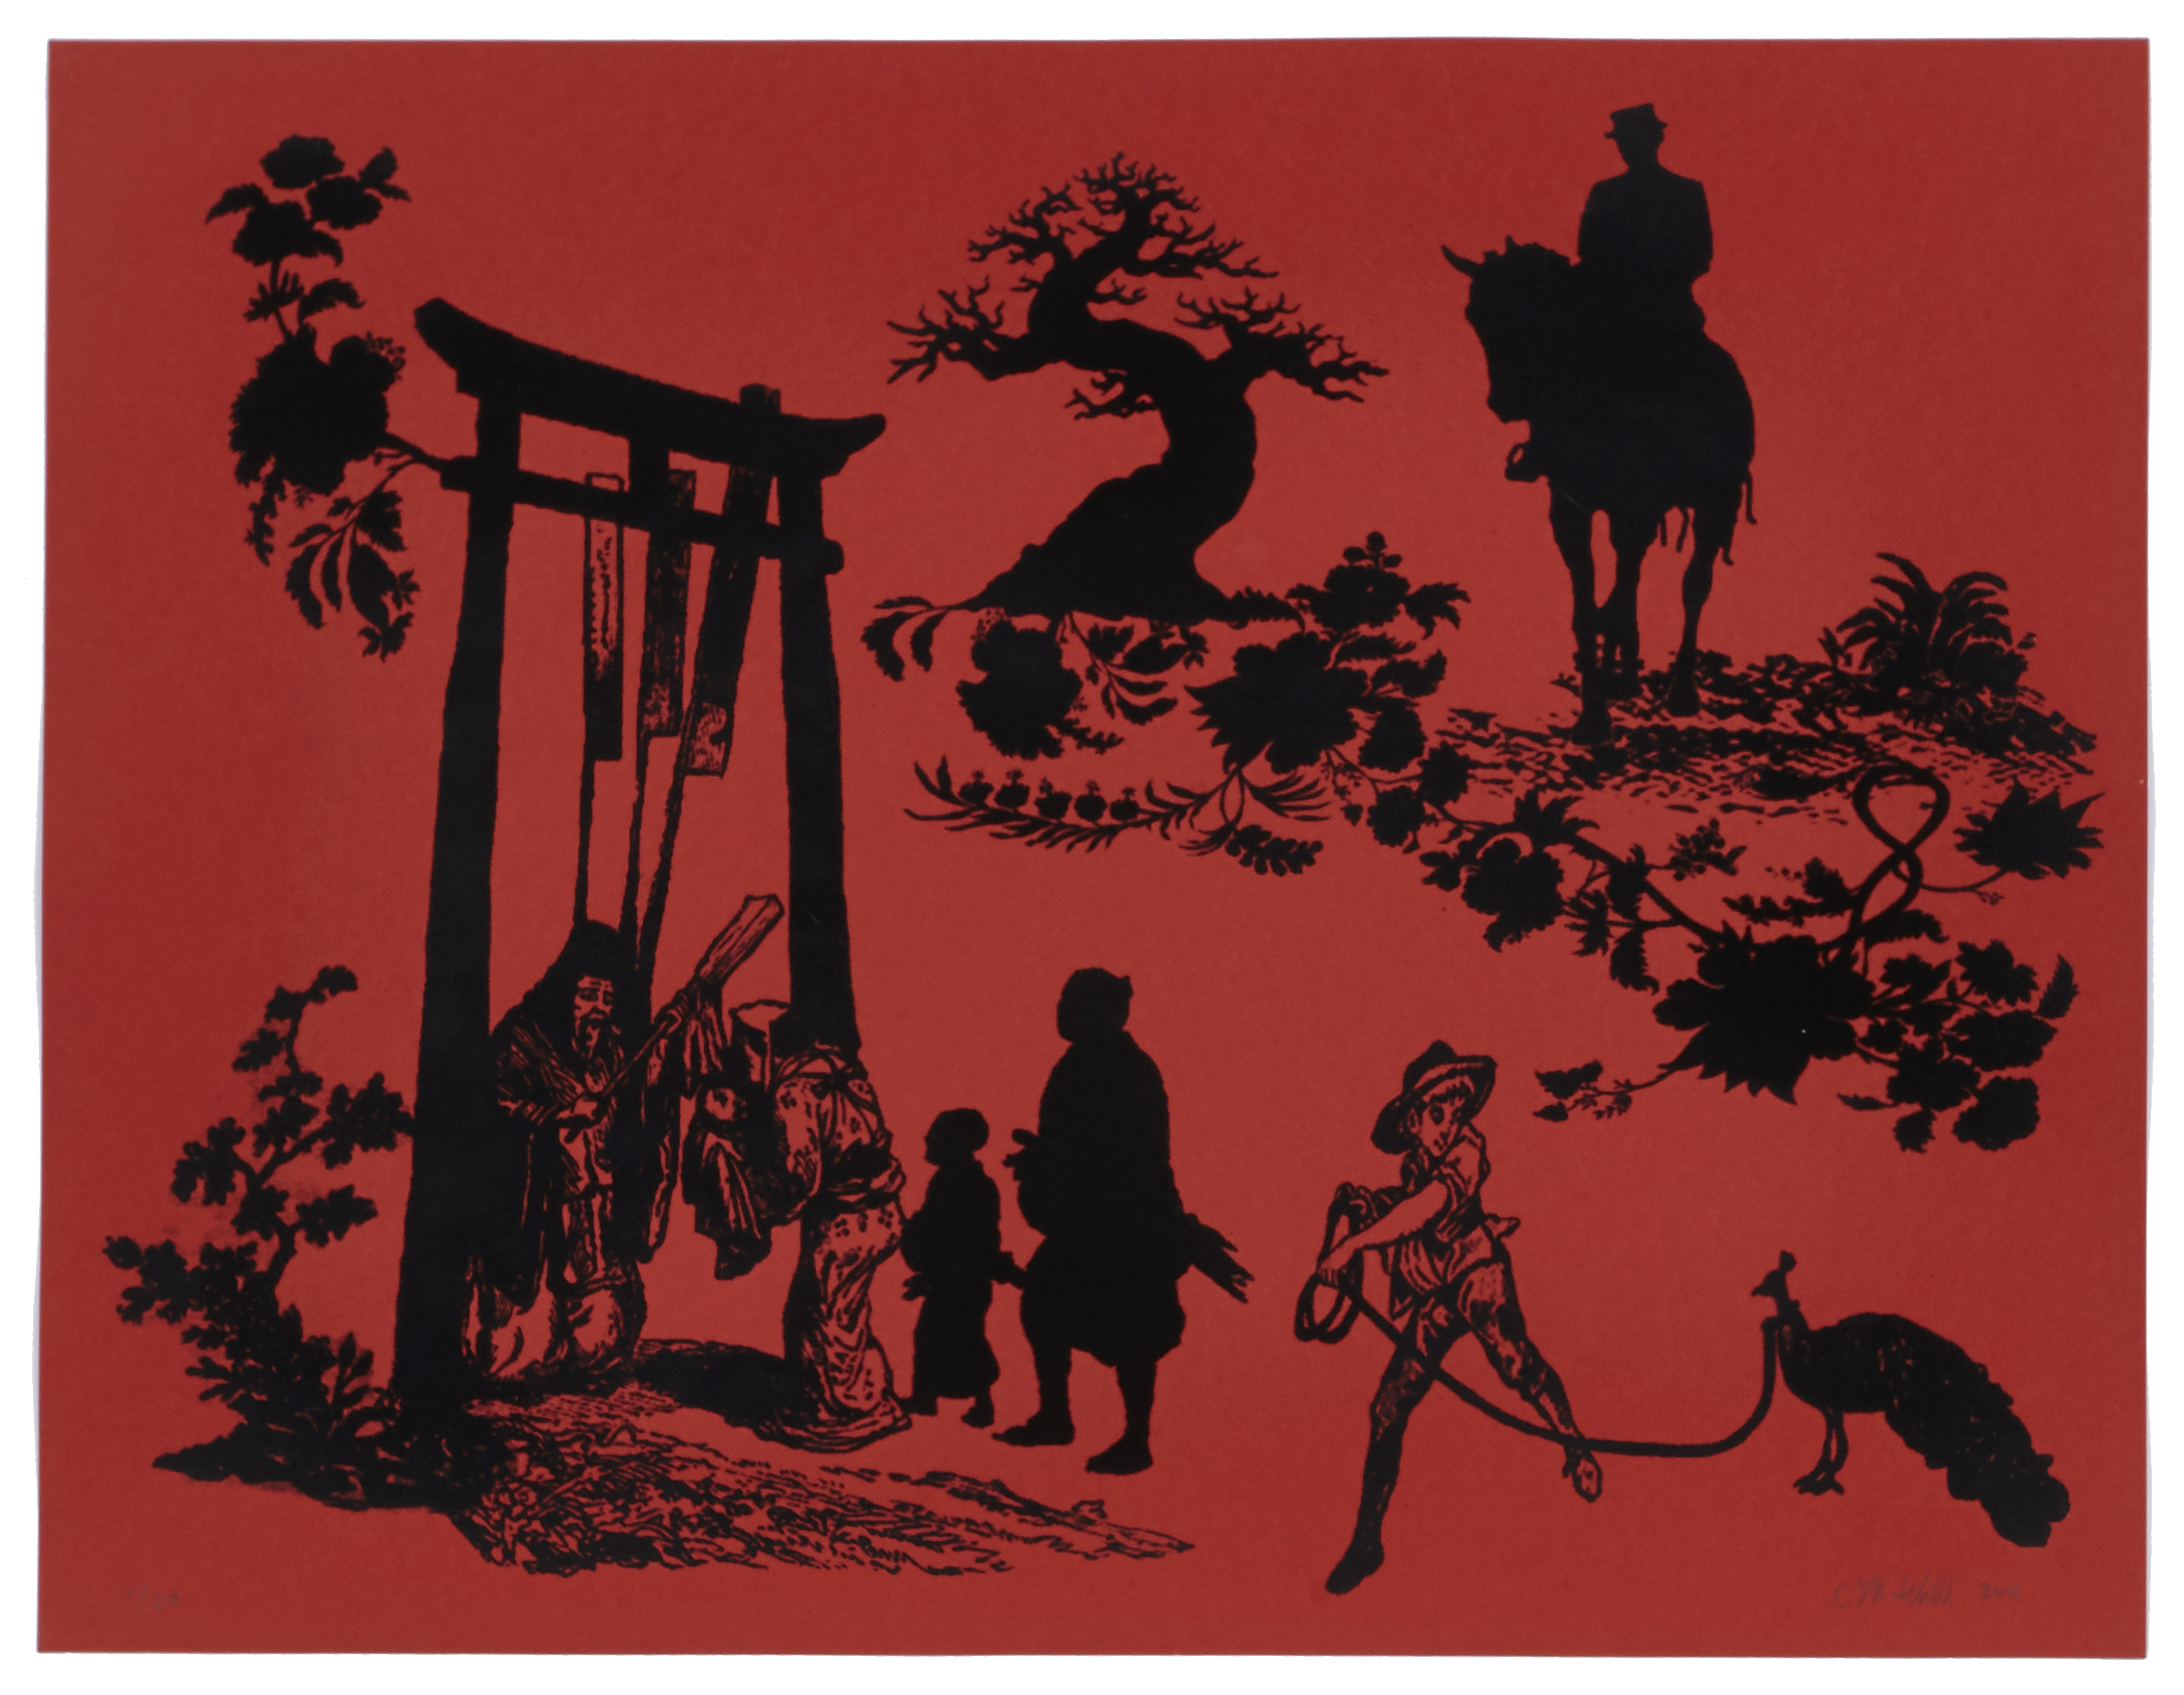 Untitled 3    2012 | 50 x 56 cm | Silkscreen | 20 prints